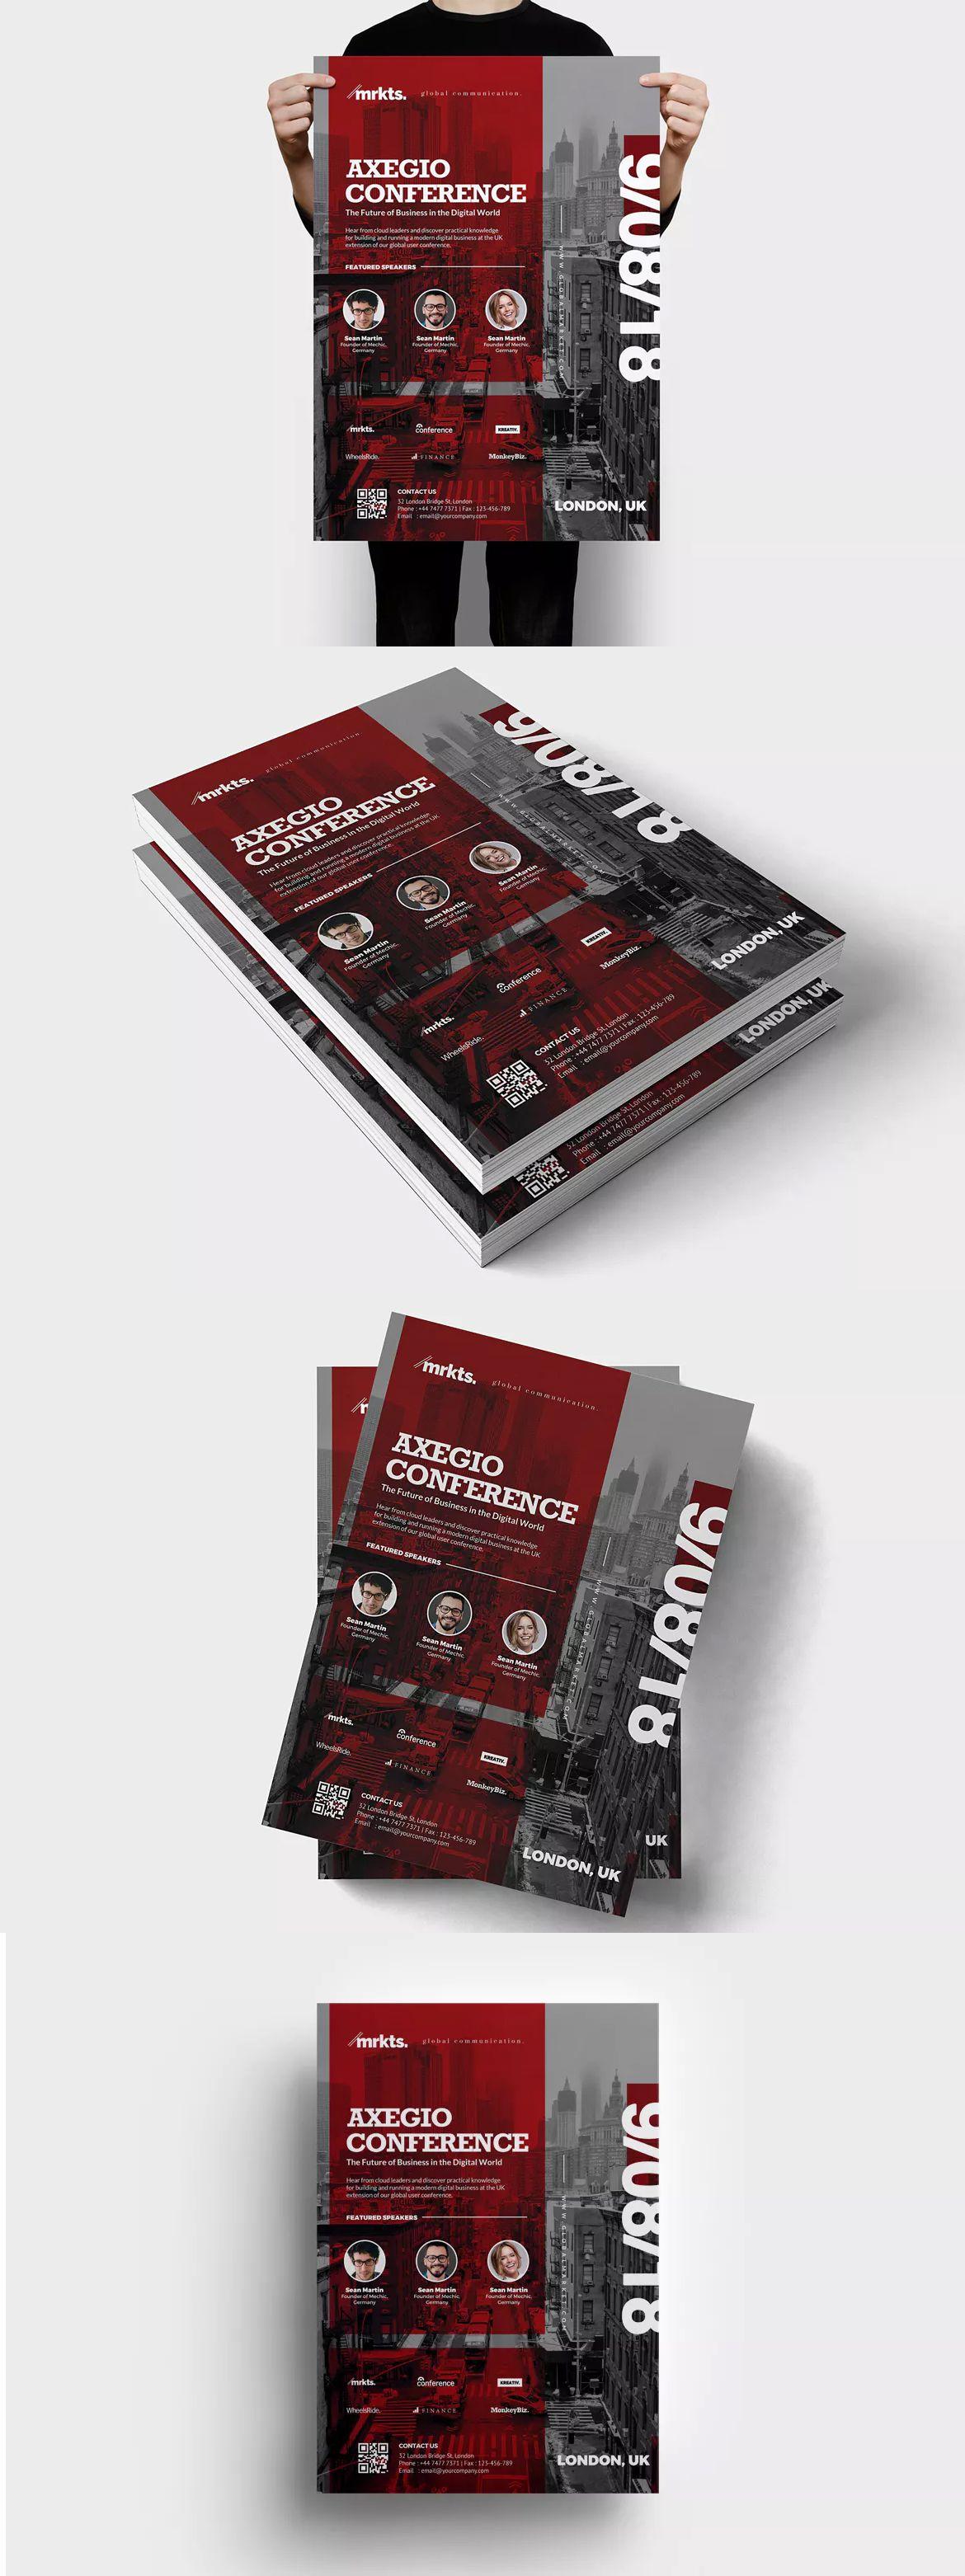 Axegio Conference Flyer Template Psd  A  Flyer Design Templates